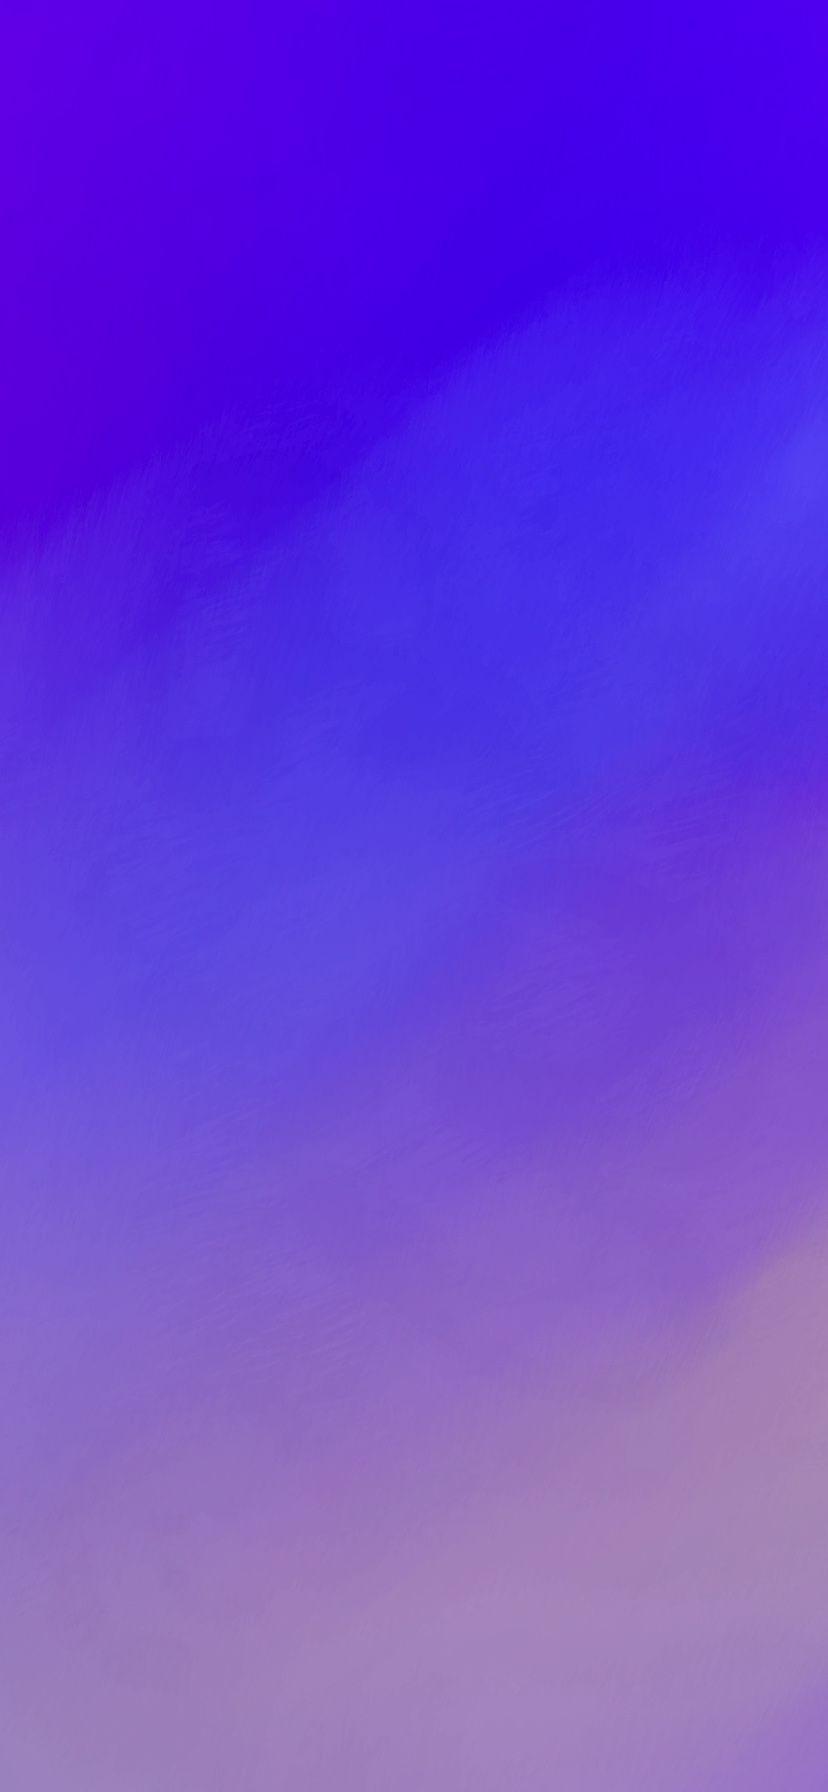 Gradient Wallpapers 青い壁紙 Iphone 携帯電話の壁紙 壁紙 Android